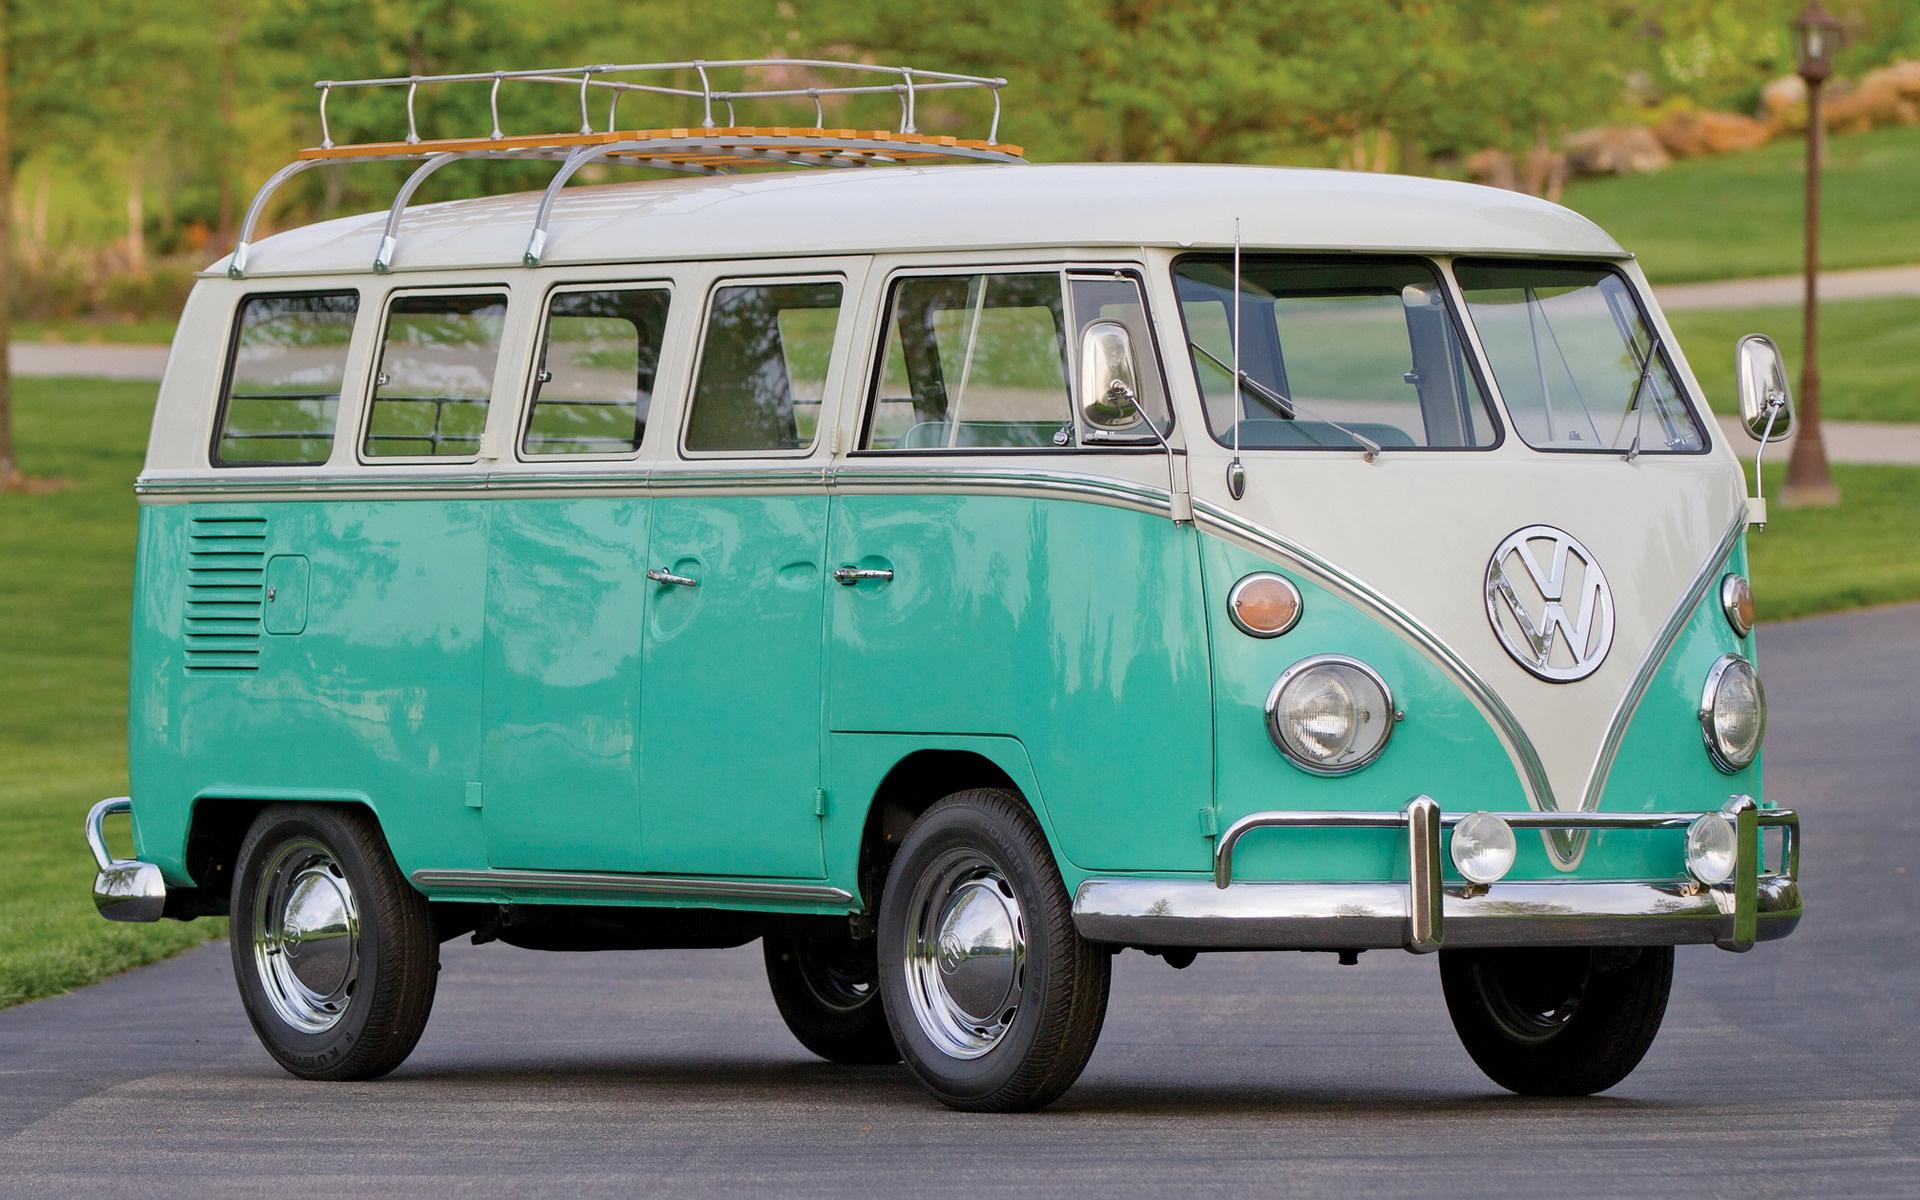 1964 Volkswagen T1 Deluxe Bus Wallpapers And Hd Images